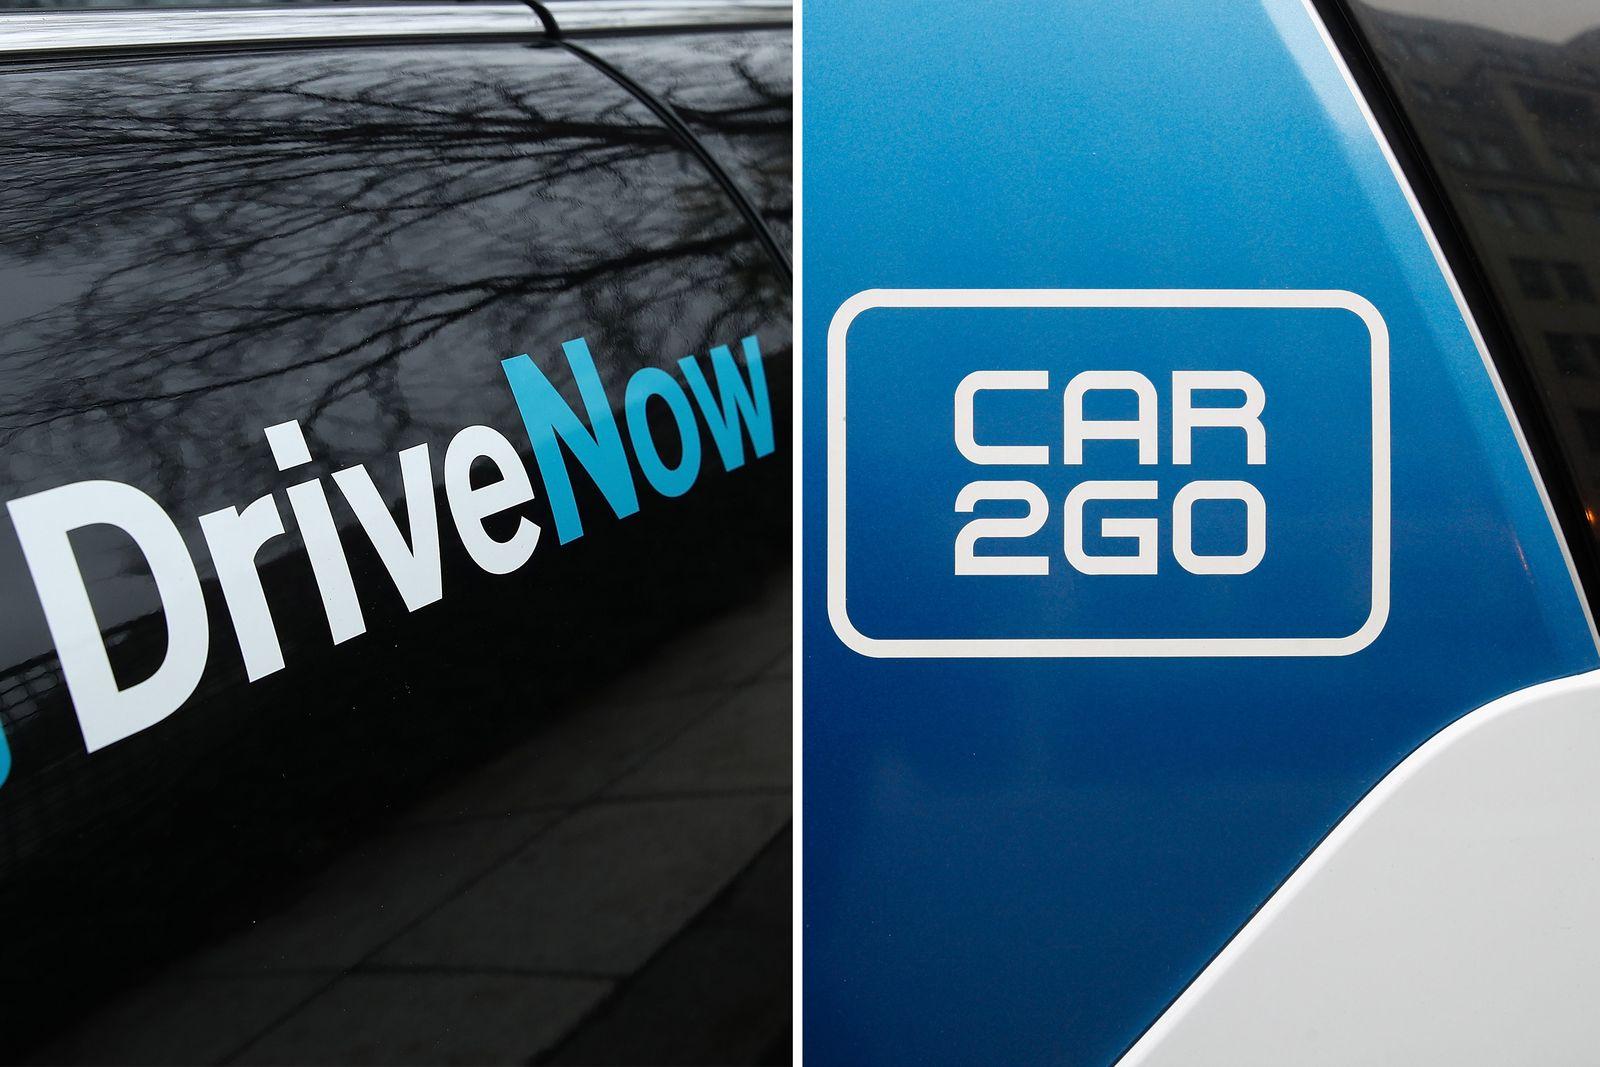 KOMBO DriveNow / car2go